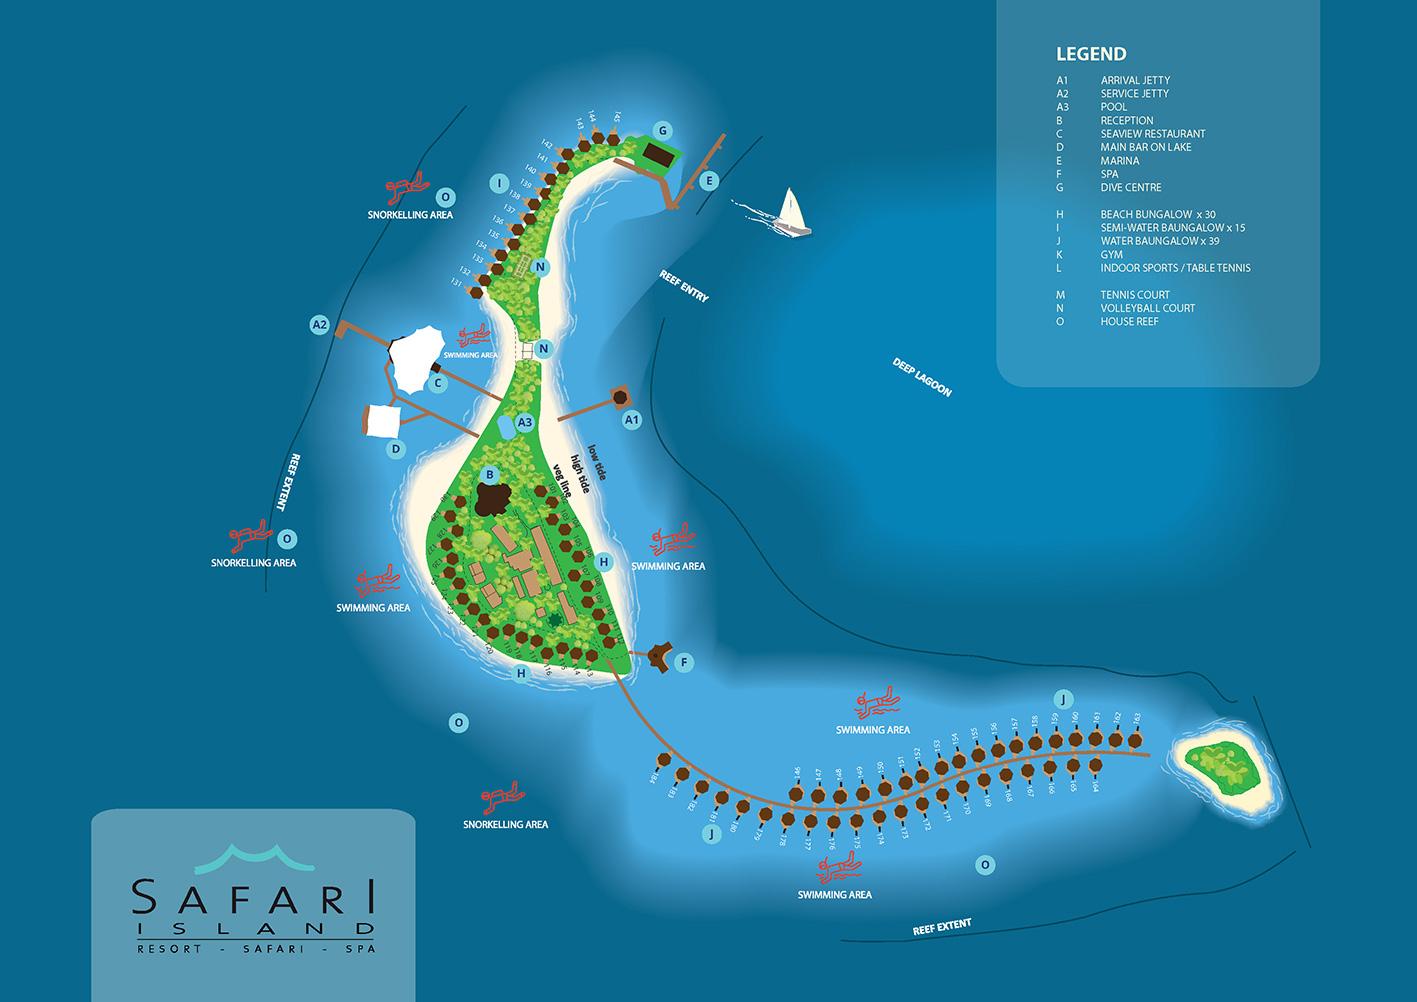 mappa Safari Island Maldive, Map Maldives